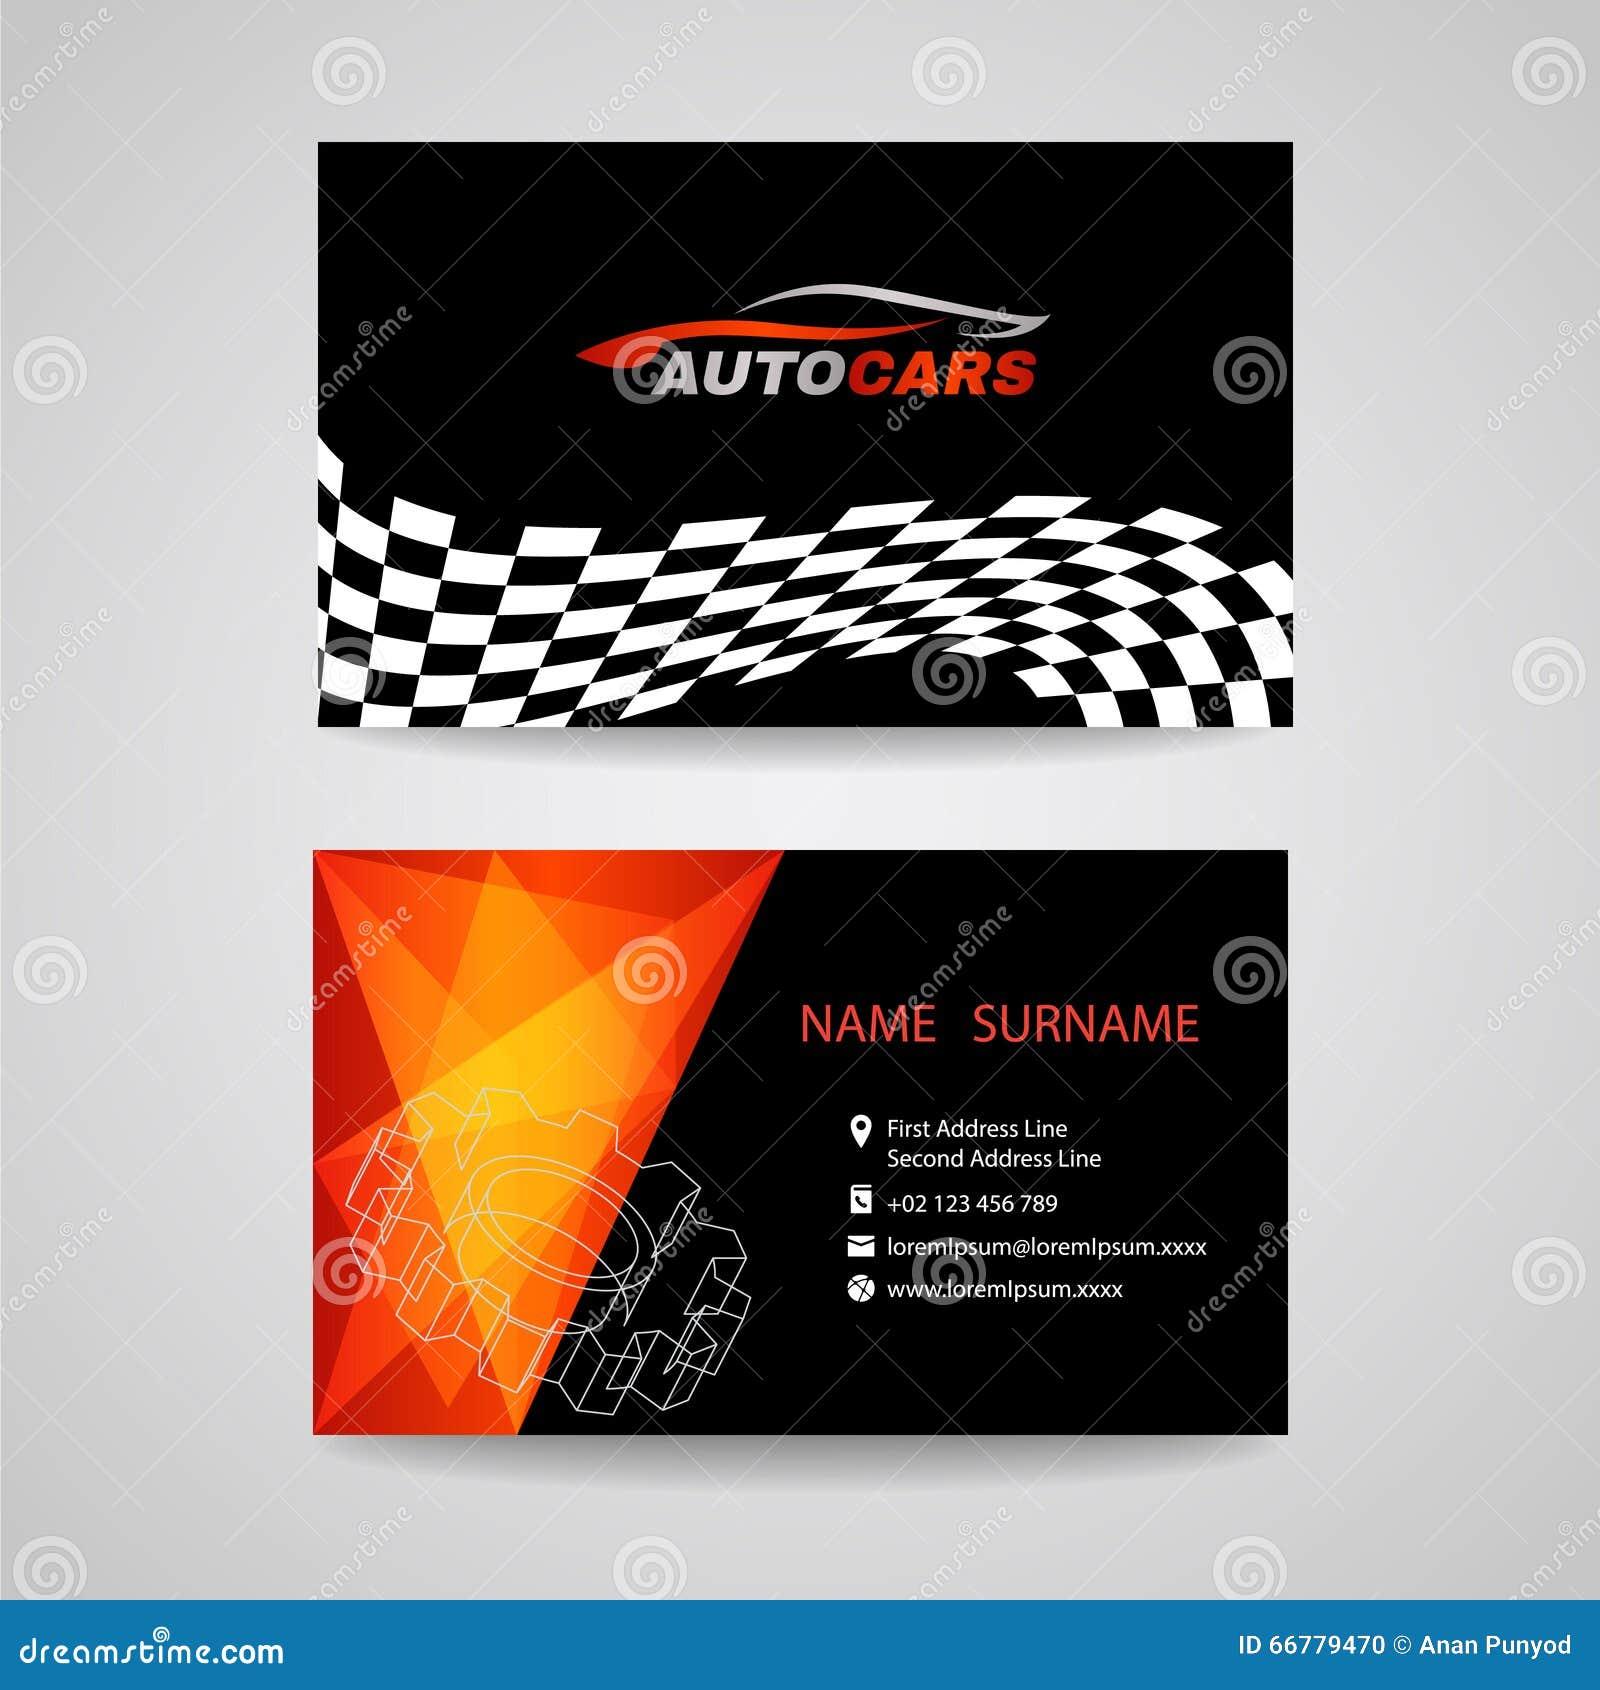 Lovely Car Garage Business Ideas Selection | Garage Design Ideas